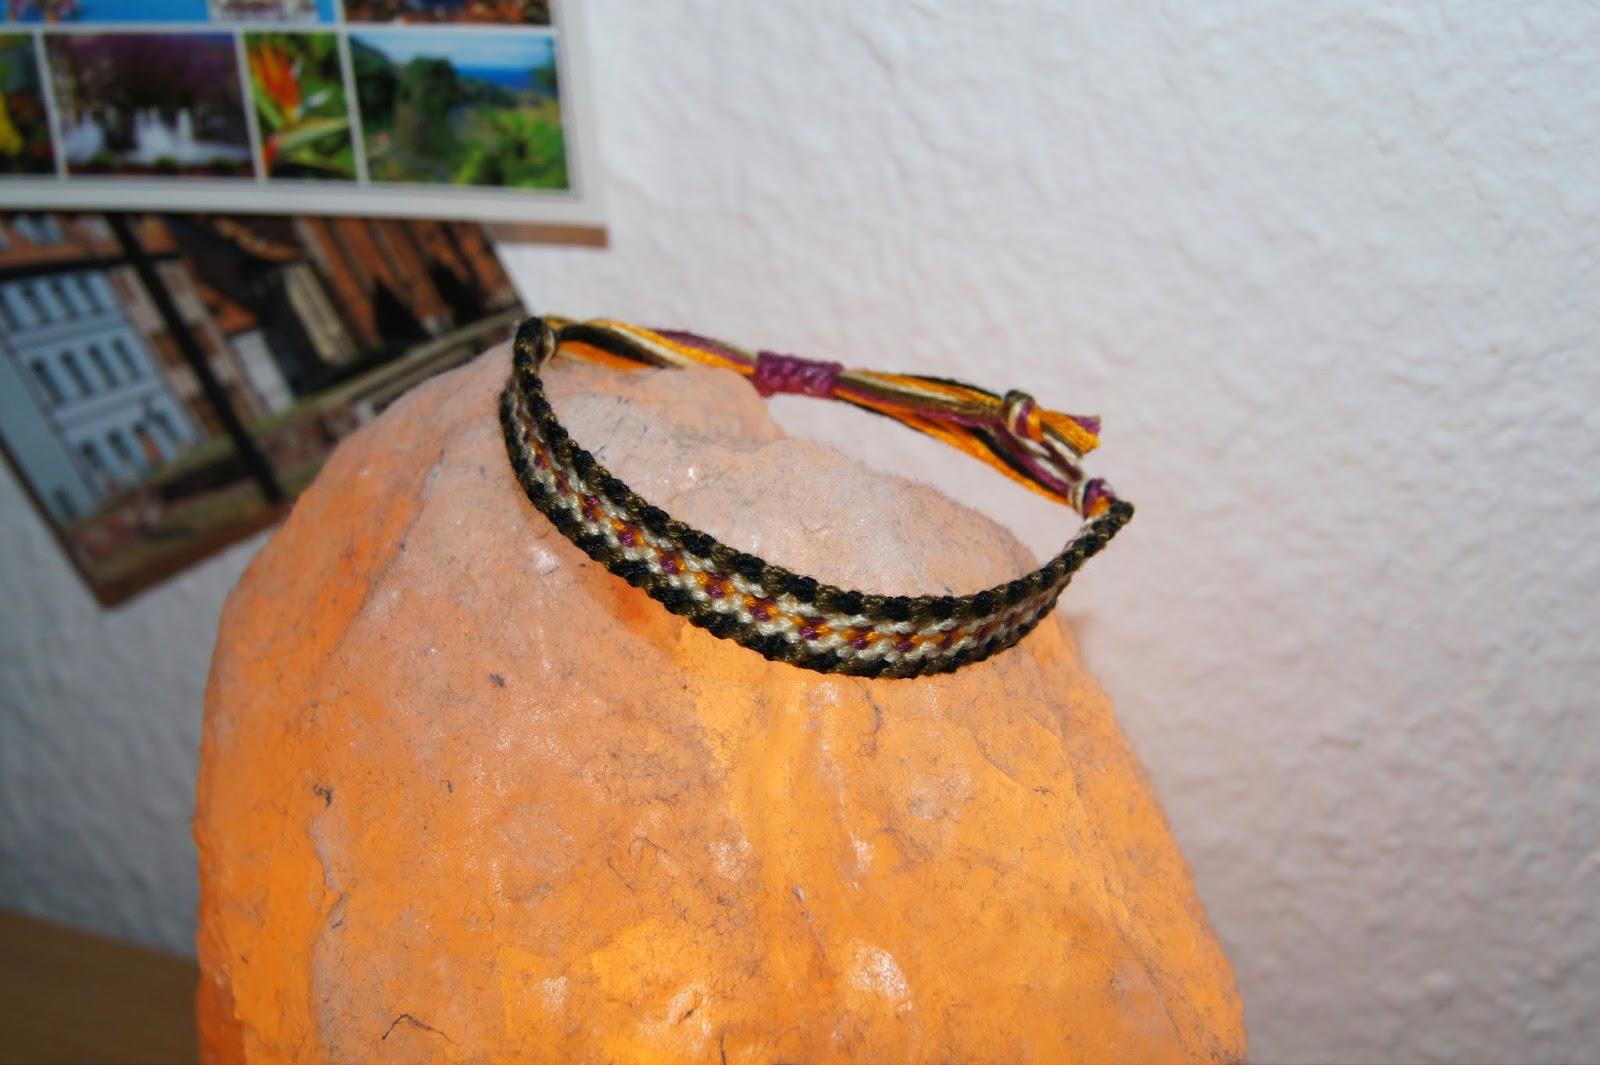 Fantastische Welt der Armbänder: Knüpfarmband \